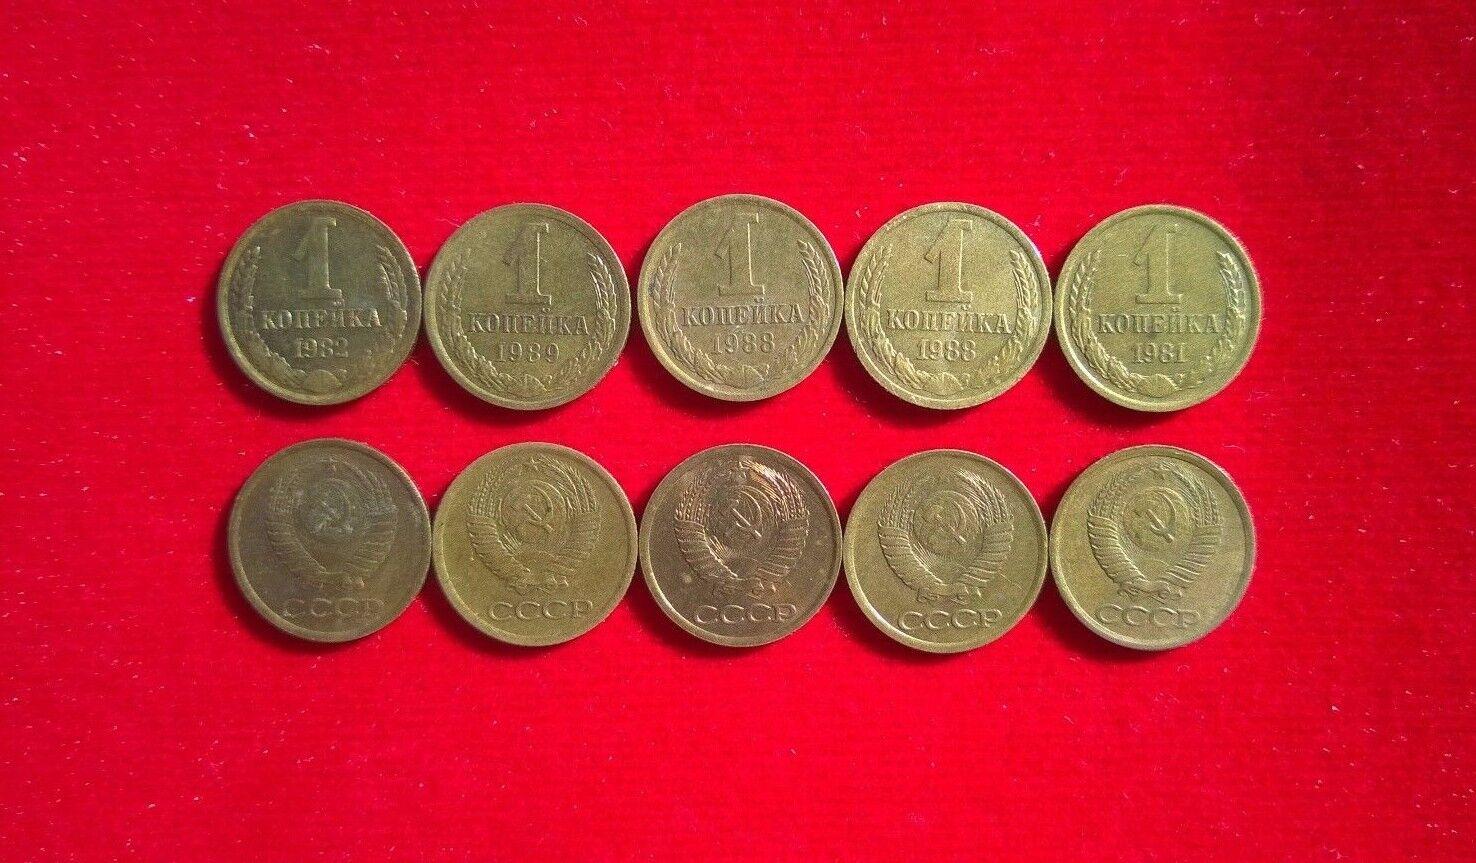 10 Kopecks Kopek 1987 CCCP World Coin USSR Soviet Union RUSSIA